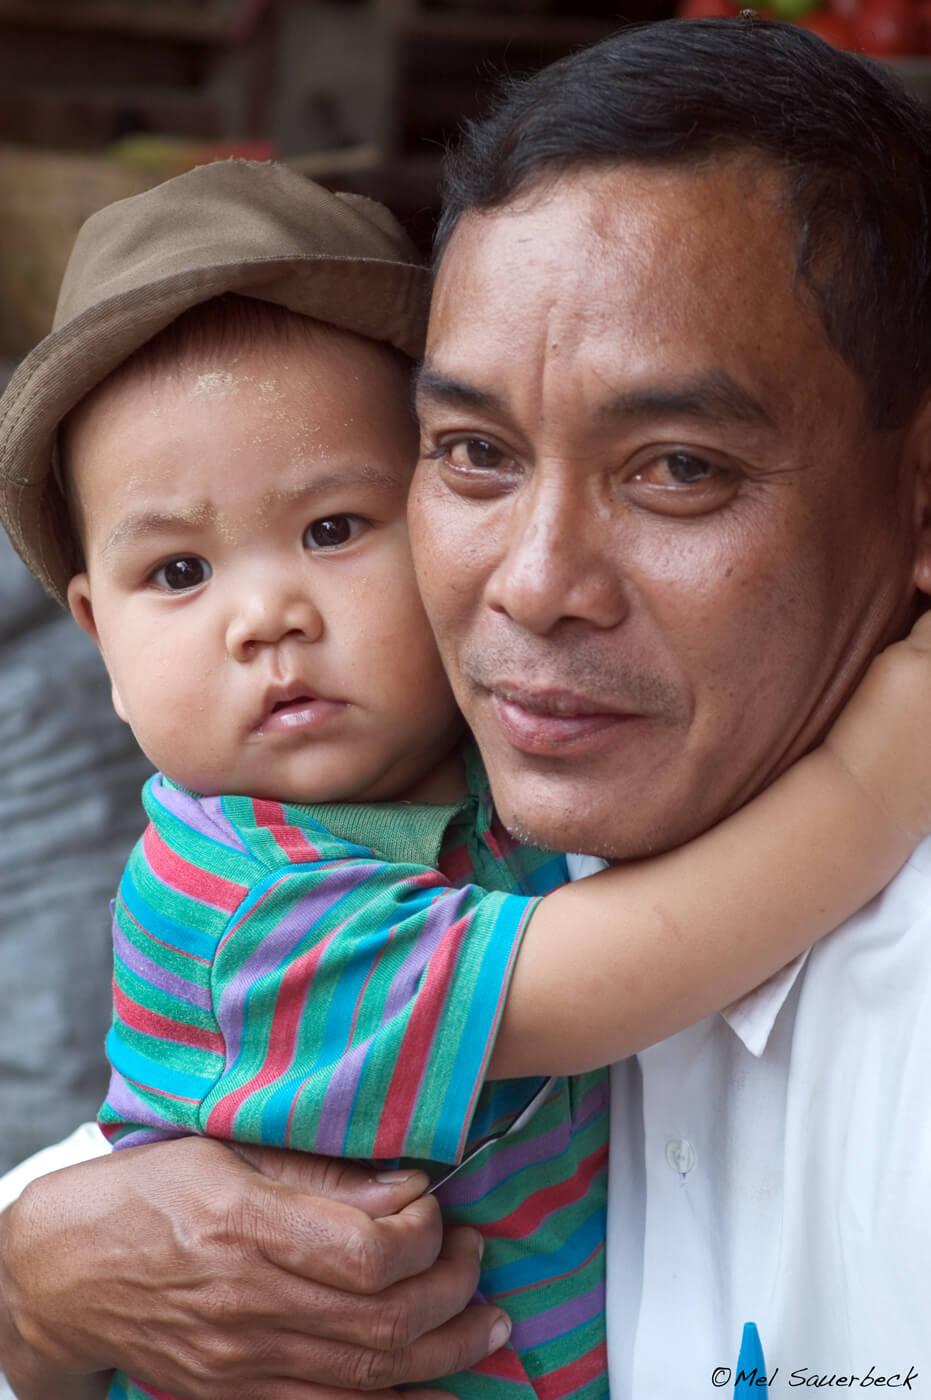 Father and son, Myanmar, Burma